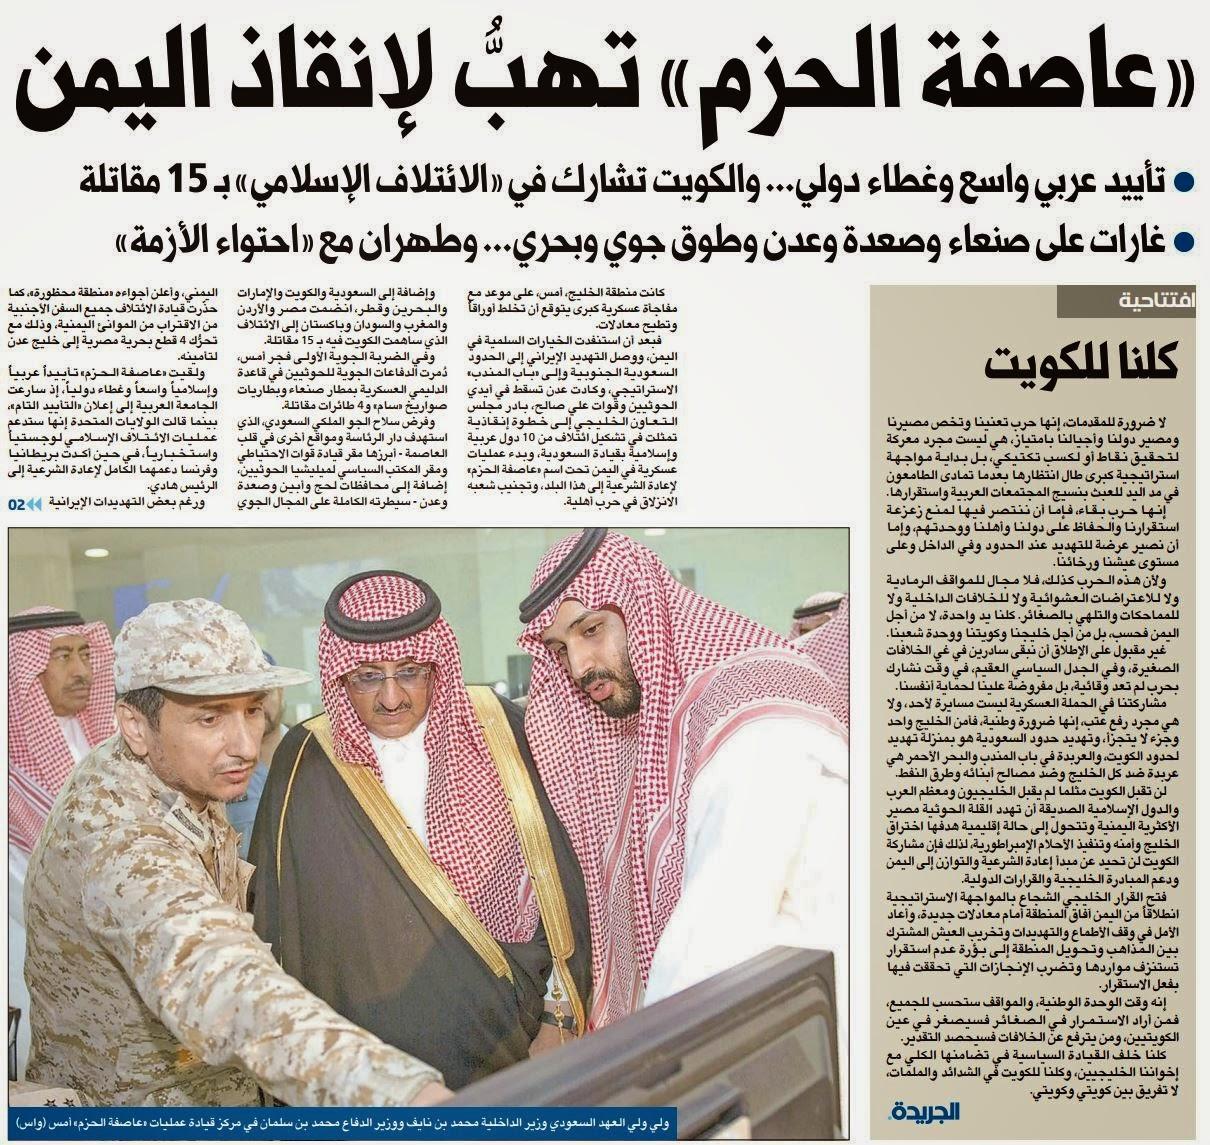 d16f02c3c لكن الذي لا يمكن أن نتفهمه، هو مشاركة القوة الجوية الكويتية في هذه الضربة  ضد